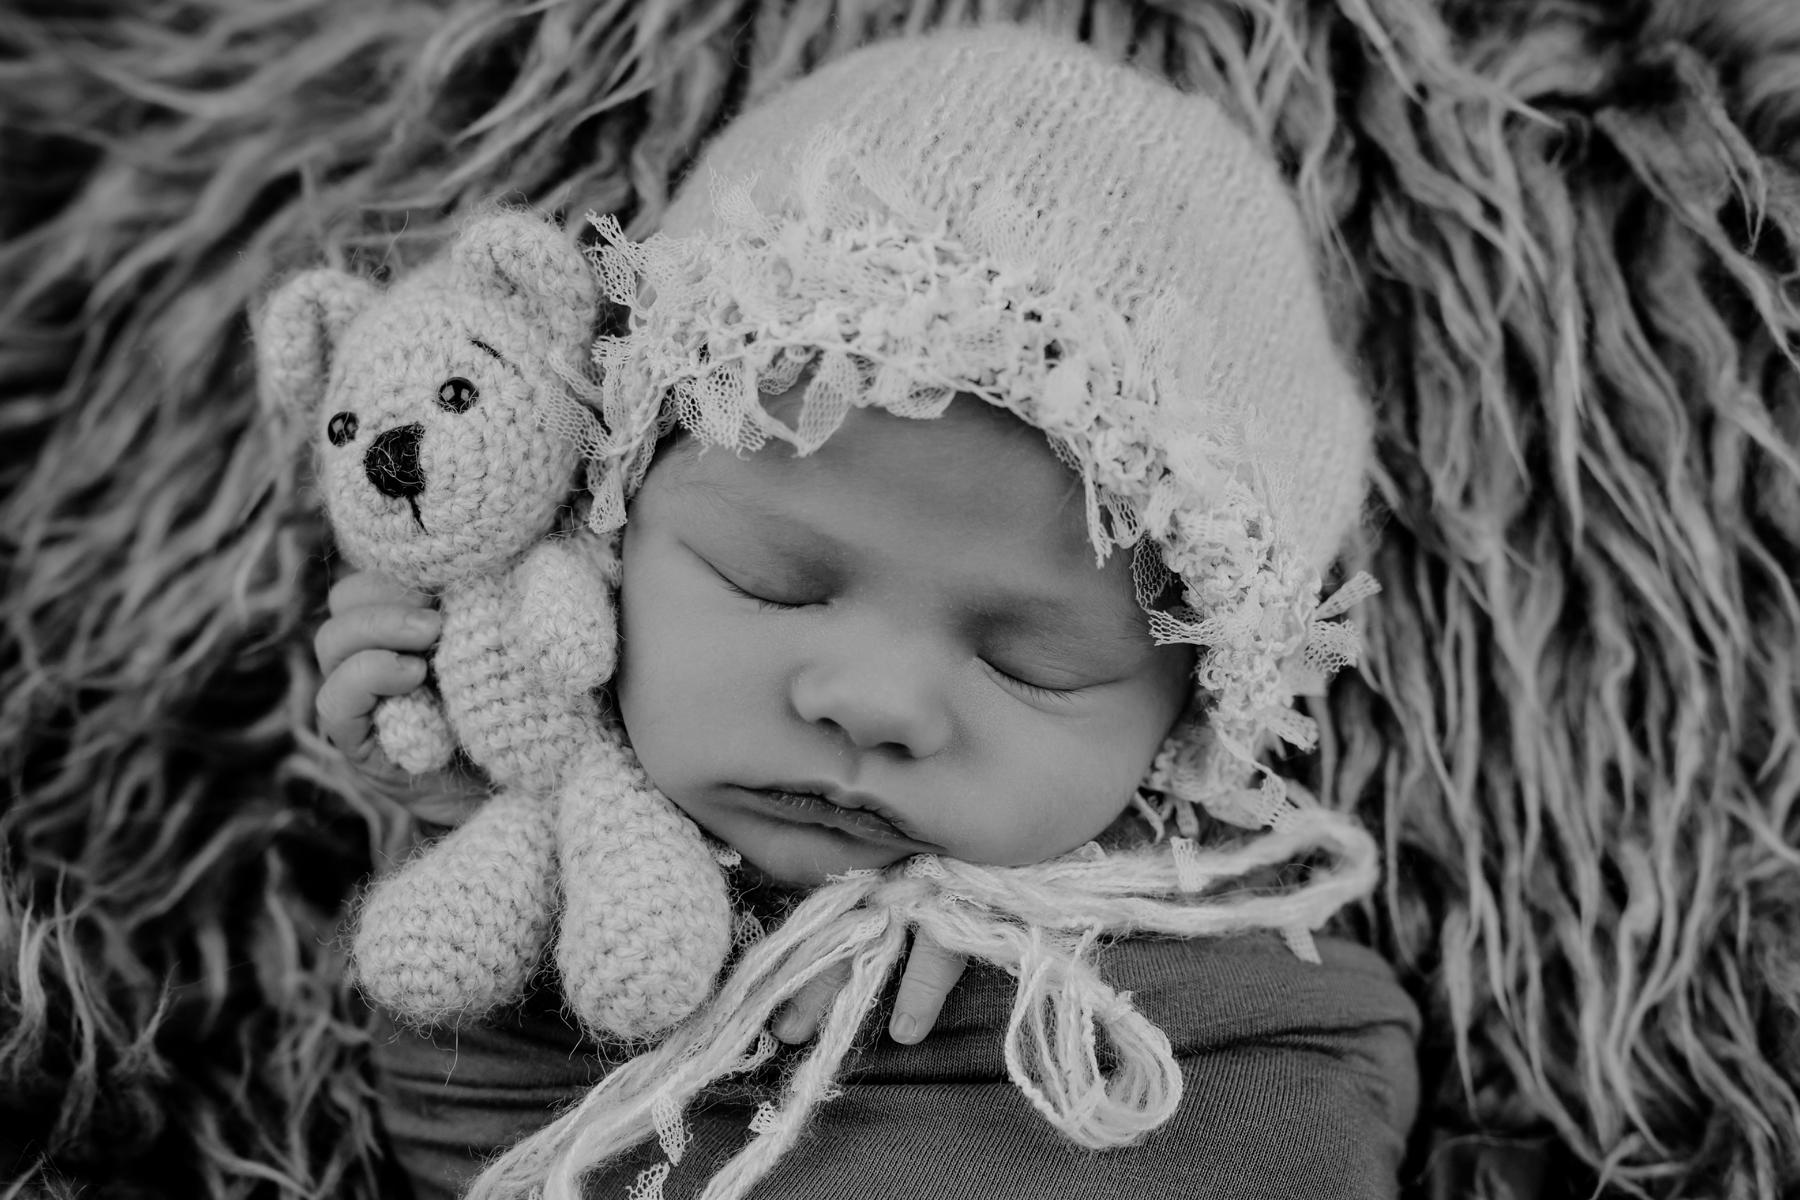 Babyfotograf Schneverdingen, Babyfotograf Tostedt, Babybilder Rotenburg Wümme, Babyshooting Soltau, Baby Fotoshooting Sittensen, Fotoshooting Newborn Brockel